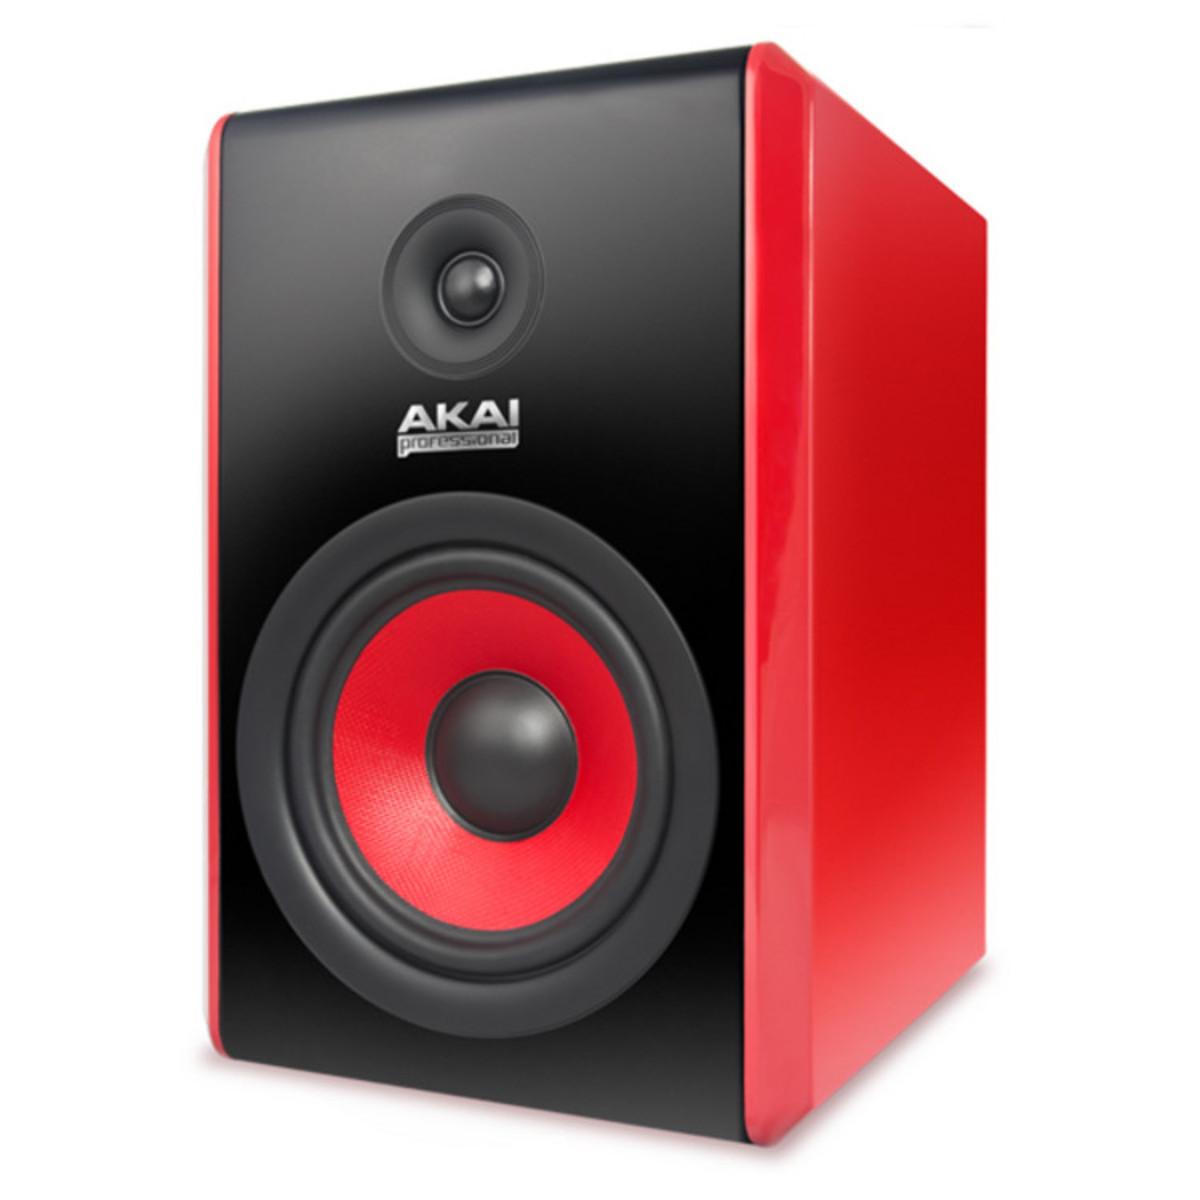 akai rpm 800 active studio monitor red single ex demo at. Black Bedroom Furniture Sets. Home Design Ideas